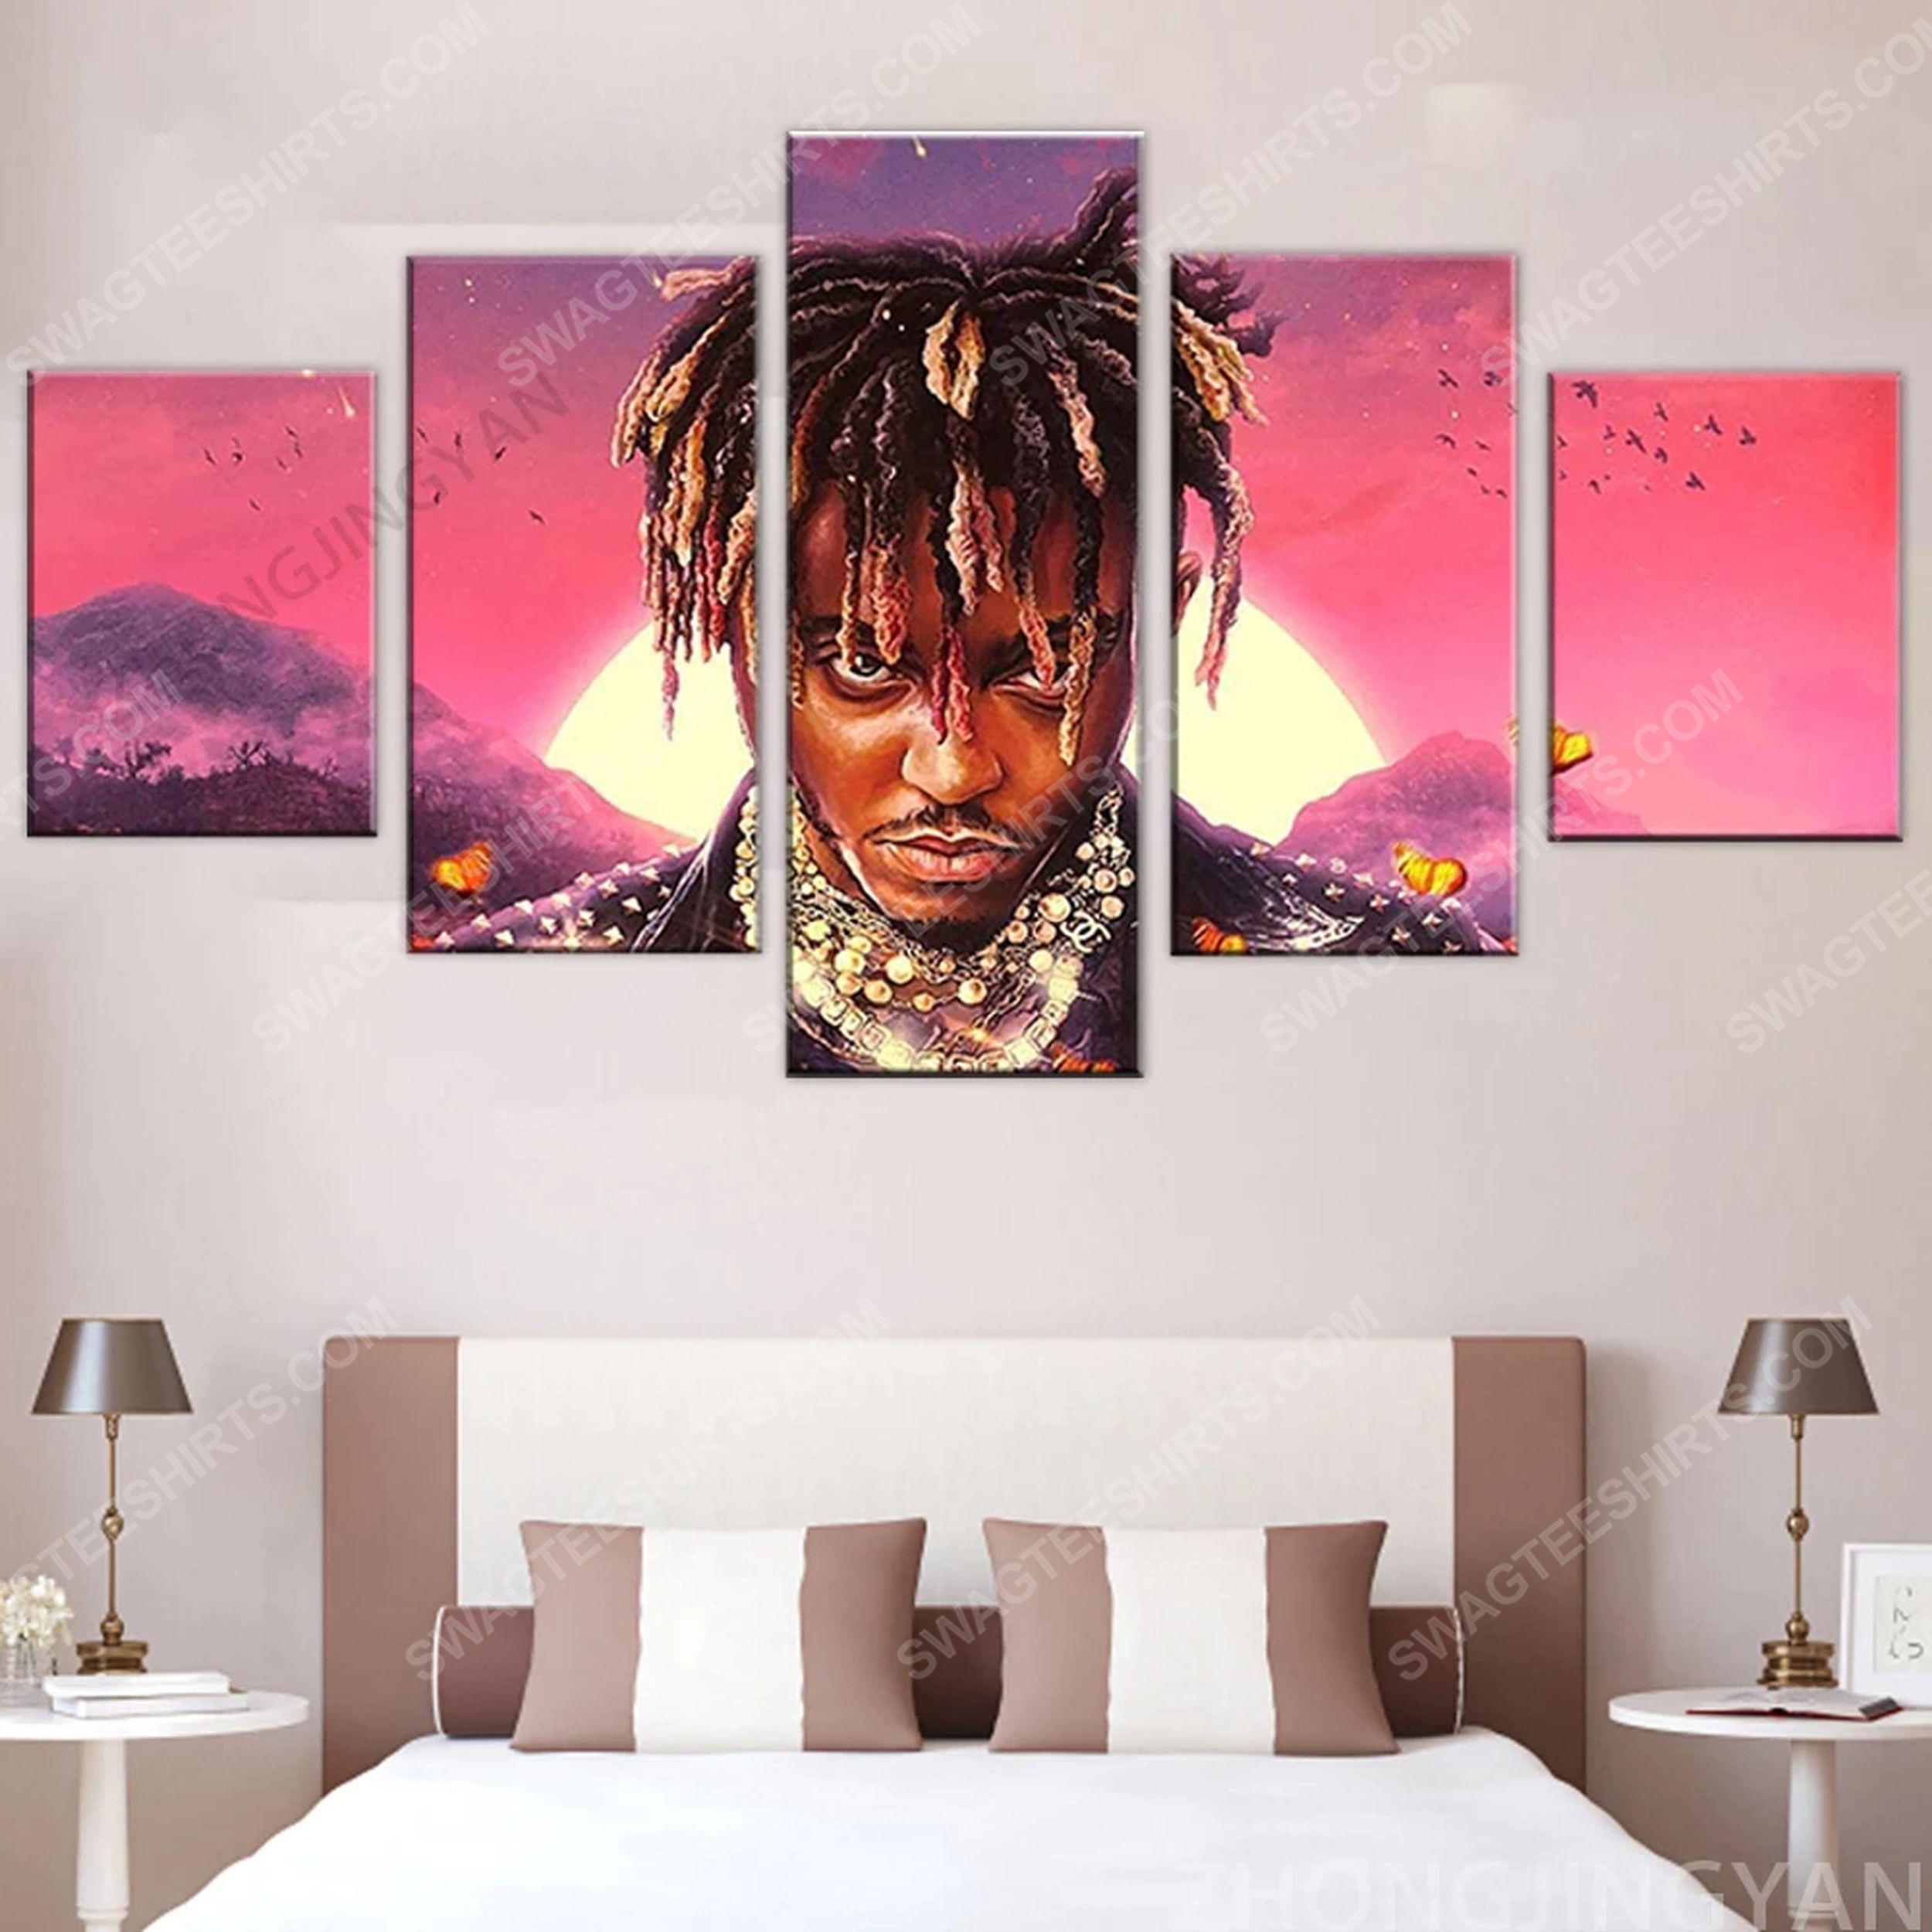 Legends never die juice wrld canvas wall art home decor